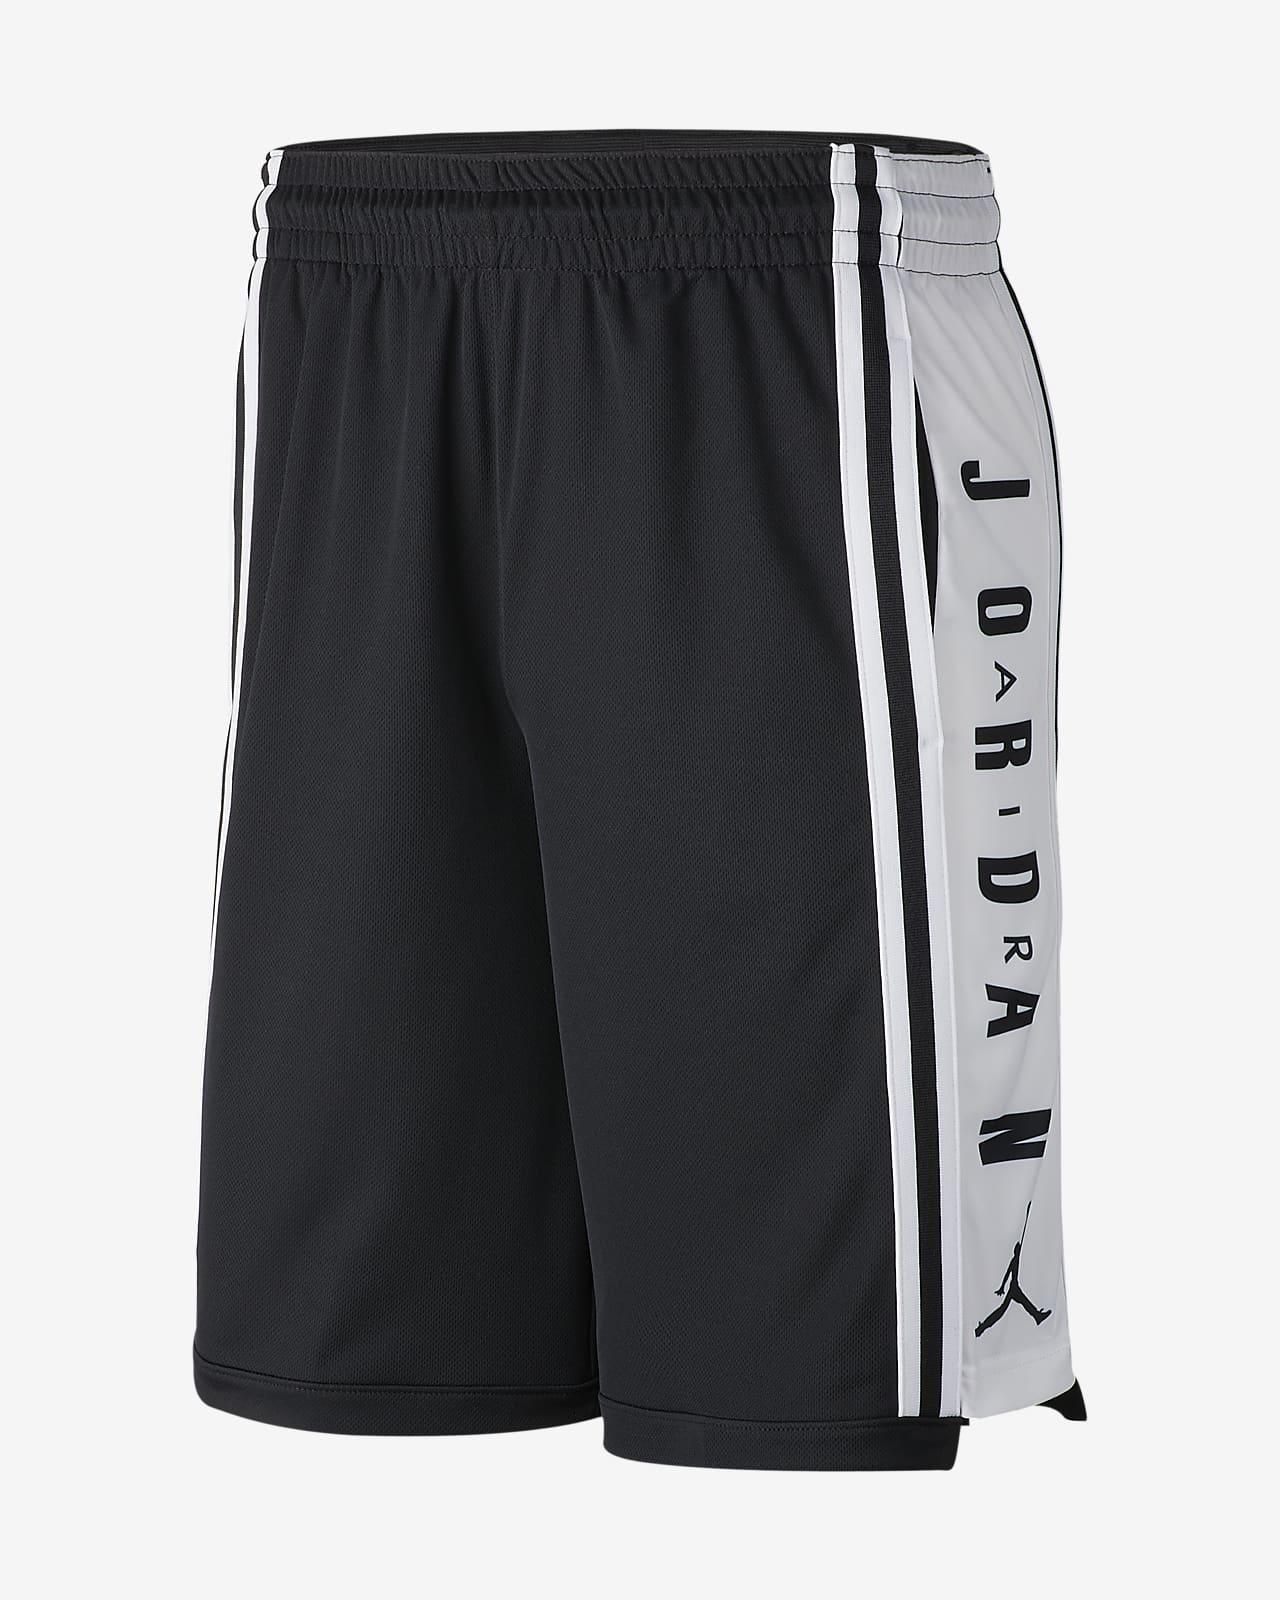 Jordan Herren-Basketballshorts